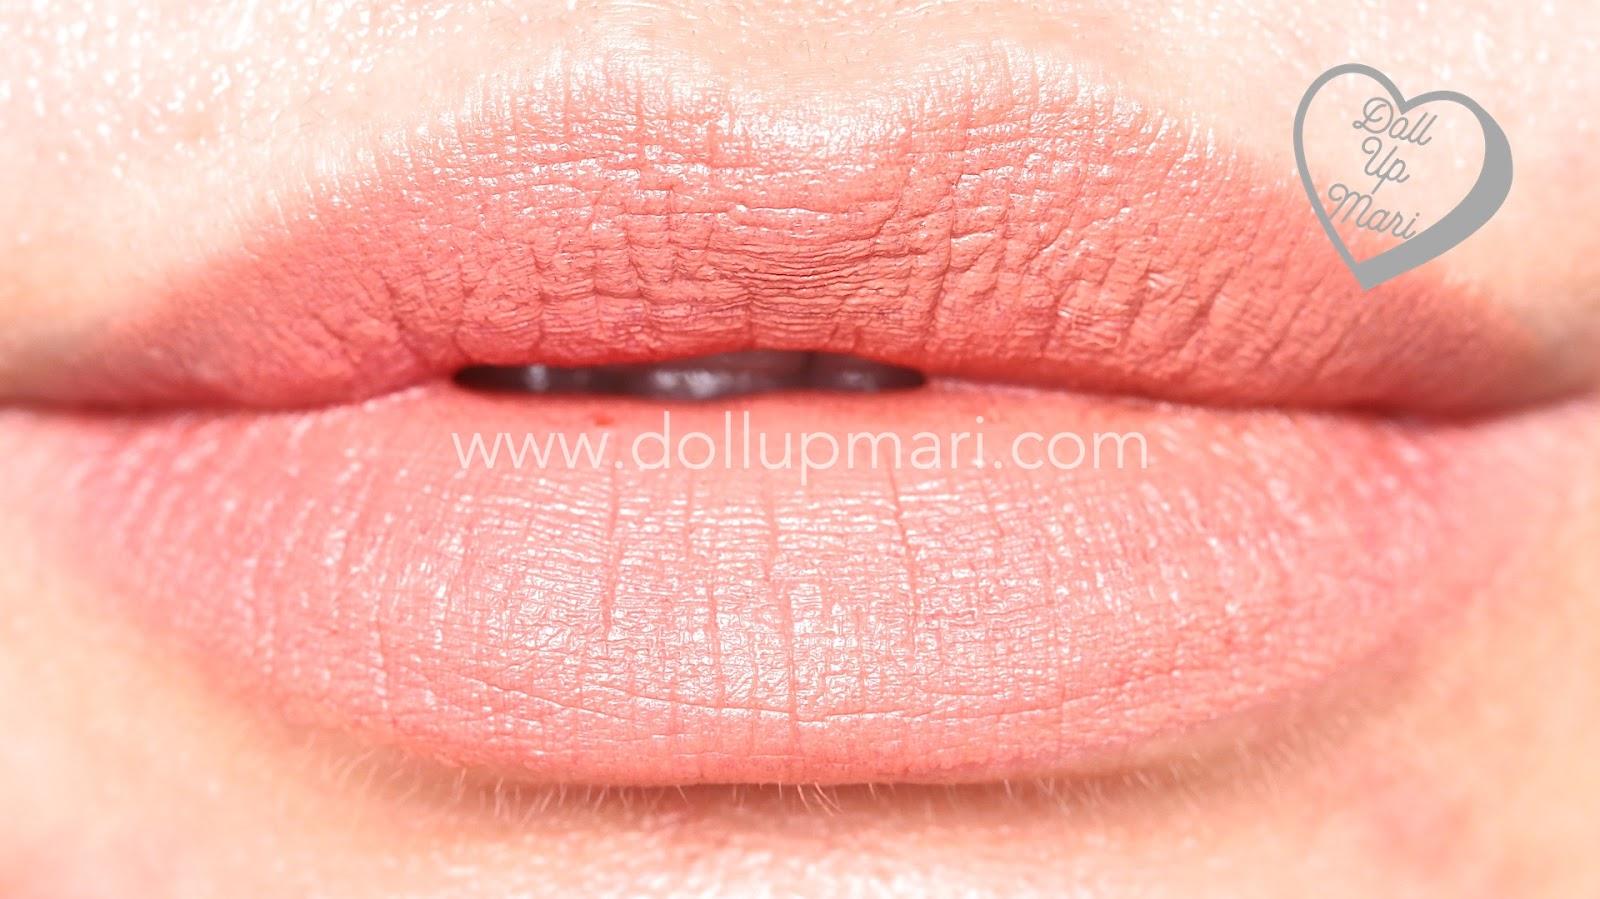 Lip Swatch of Au Naturale shade of AVON Perfectly Matte Lipstick